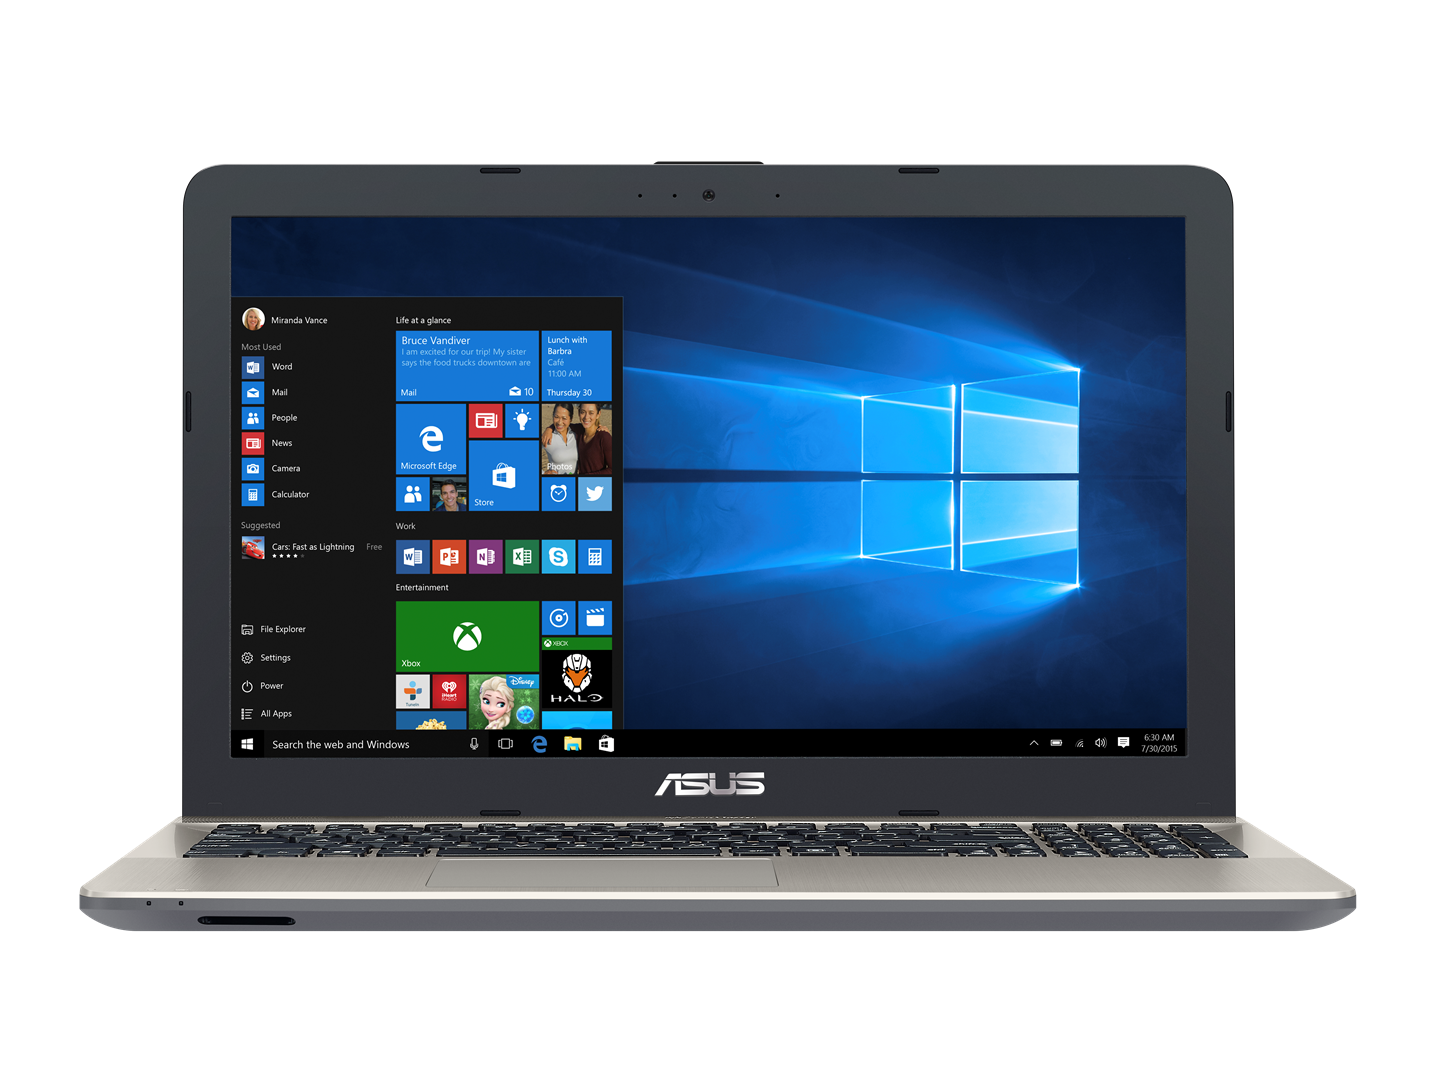 "ASUS X541NA-GO120T Celeron N3350/4GB/500GB/Graphics Share/15,6"" HD lesklý/BT/W10 Home/Black/Gold"